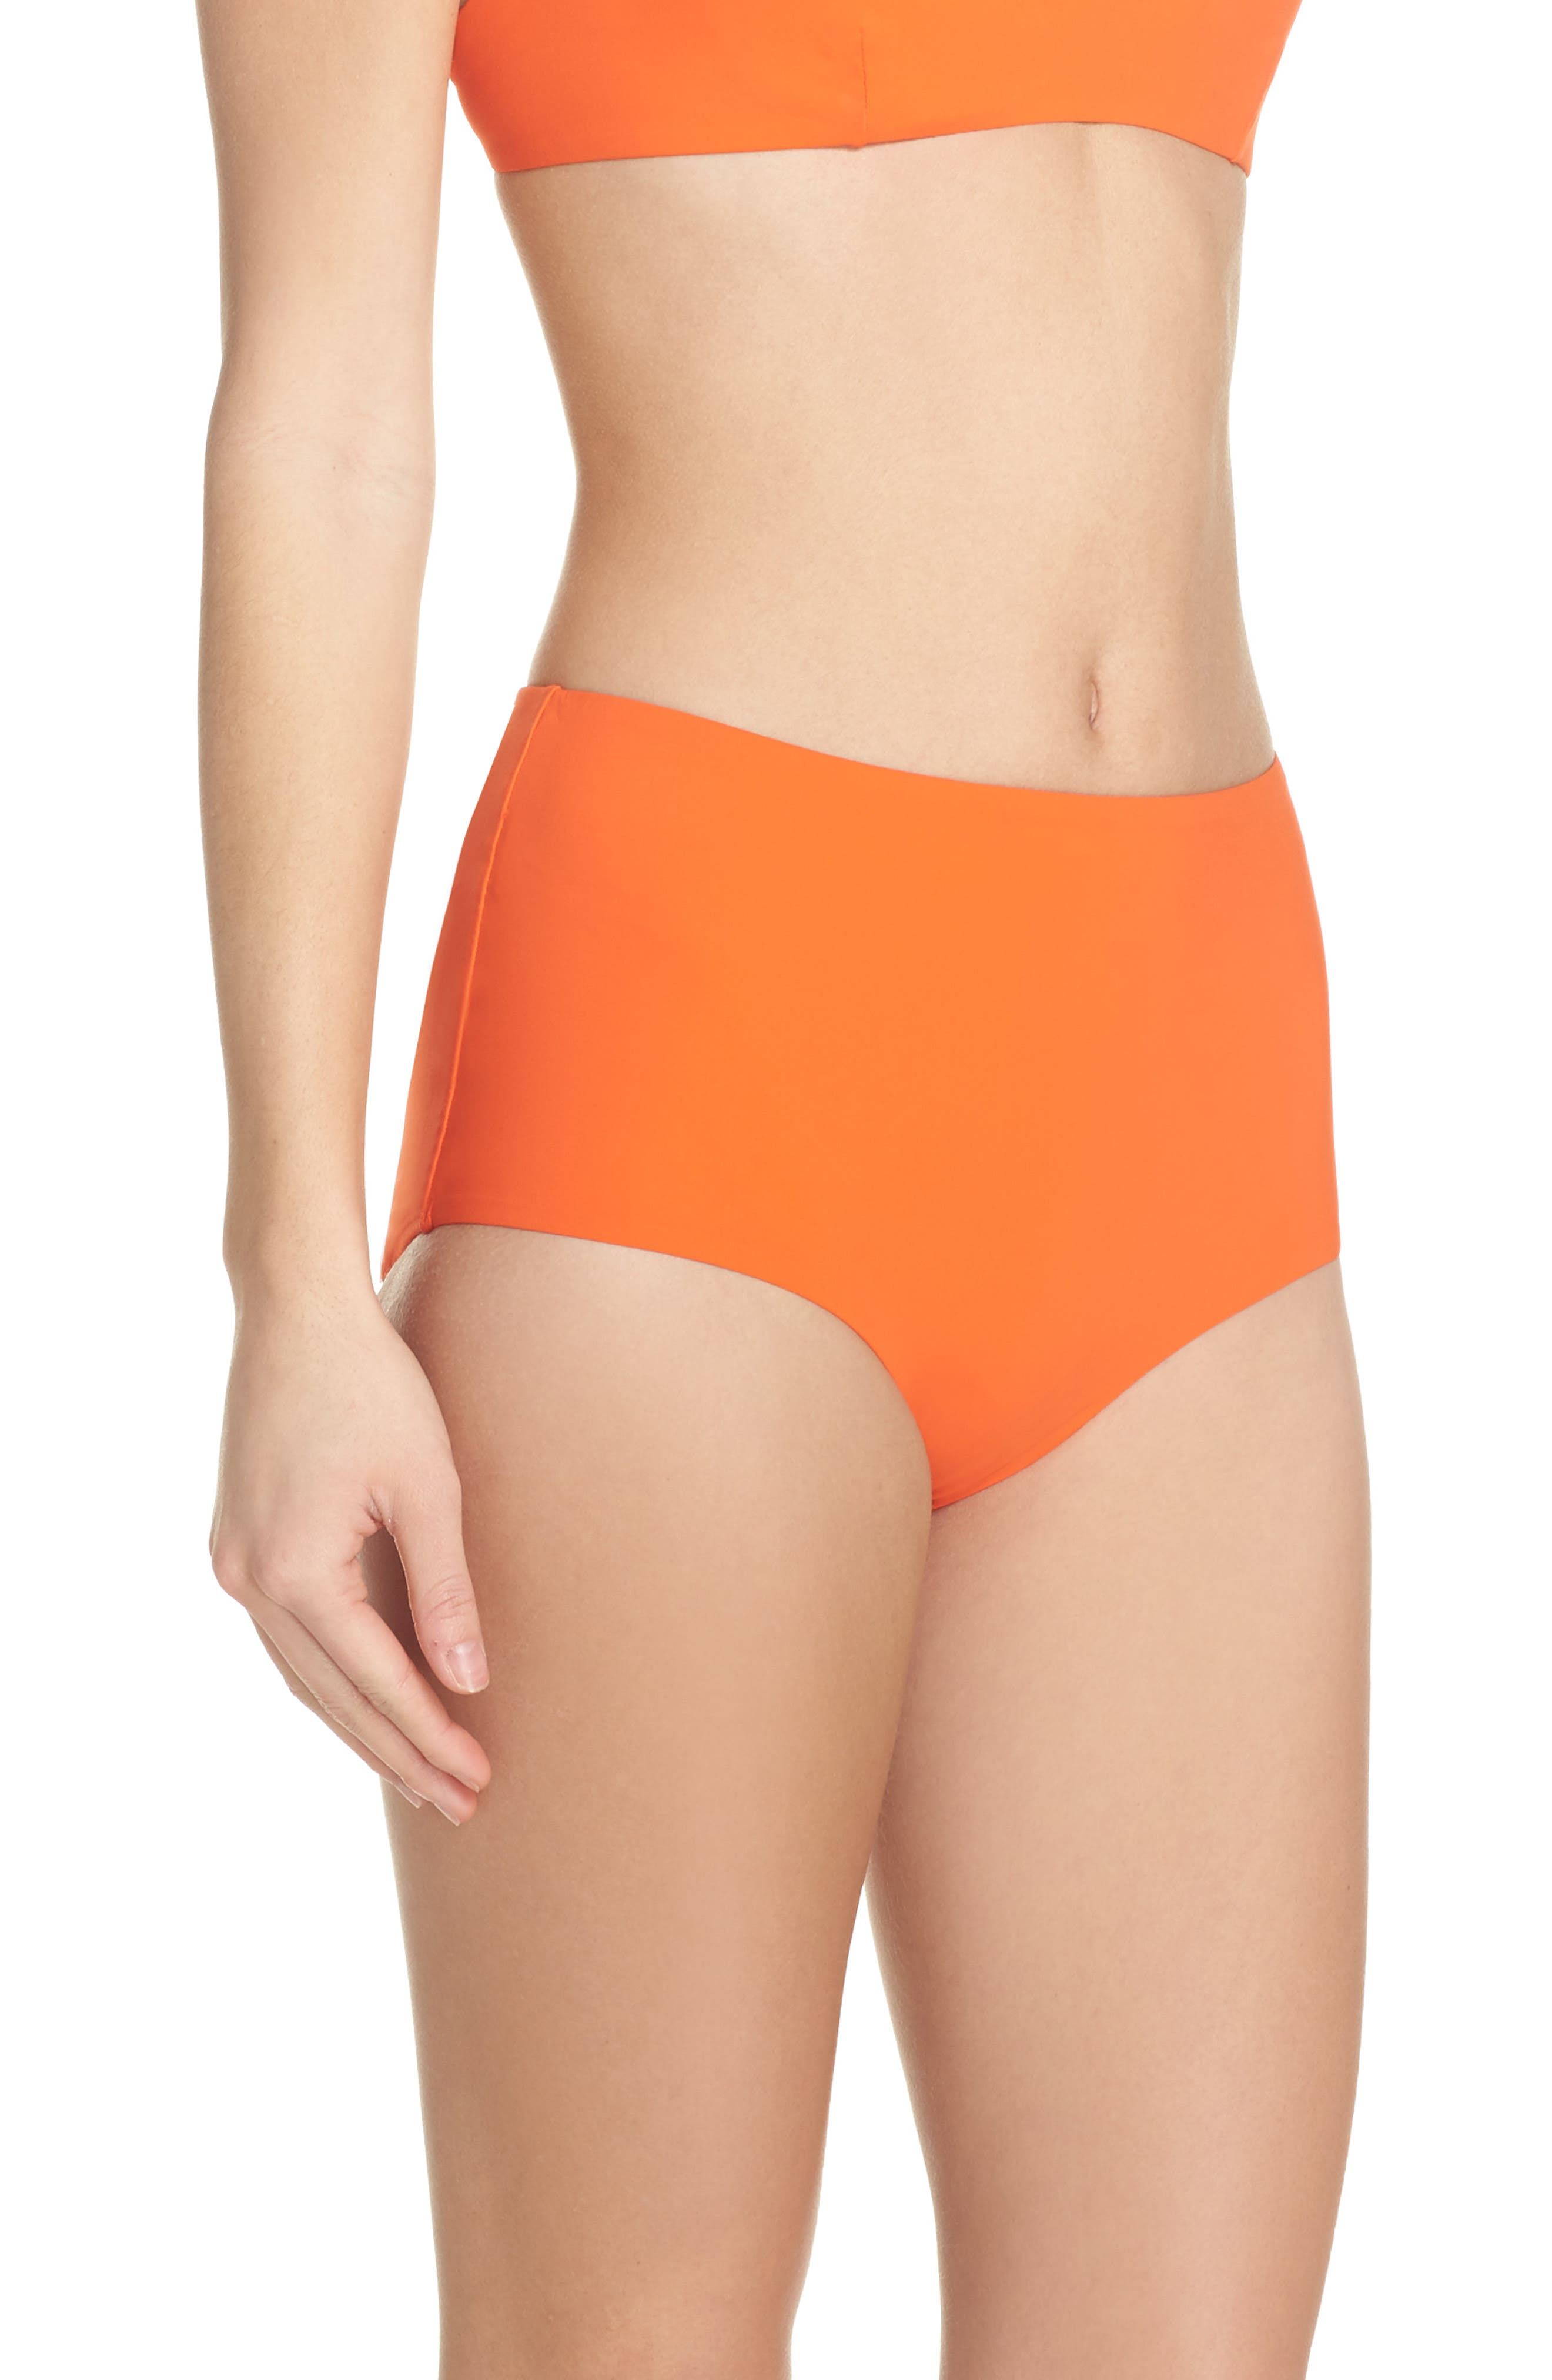 Marina High Waist Bikini Bottoms,                             Alternate thumbnail 3, color,                             Sweet Tangerine